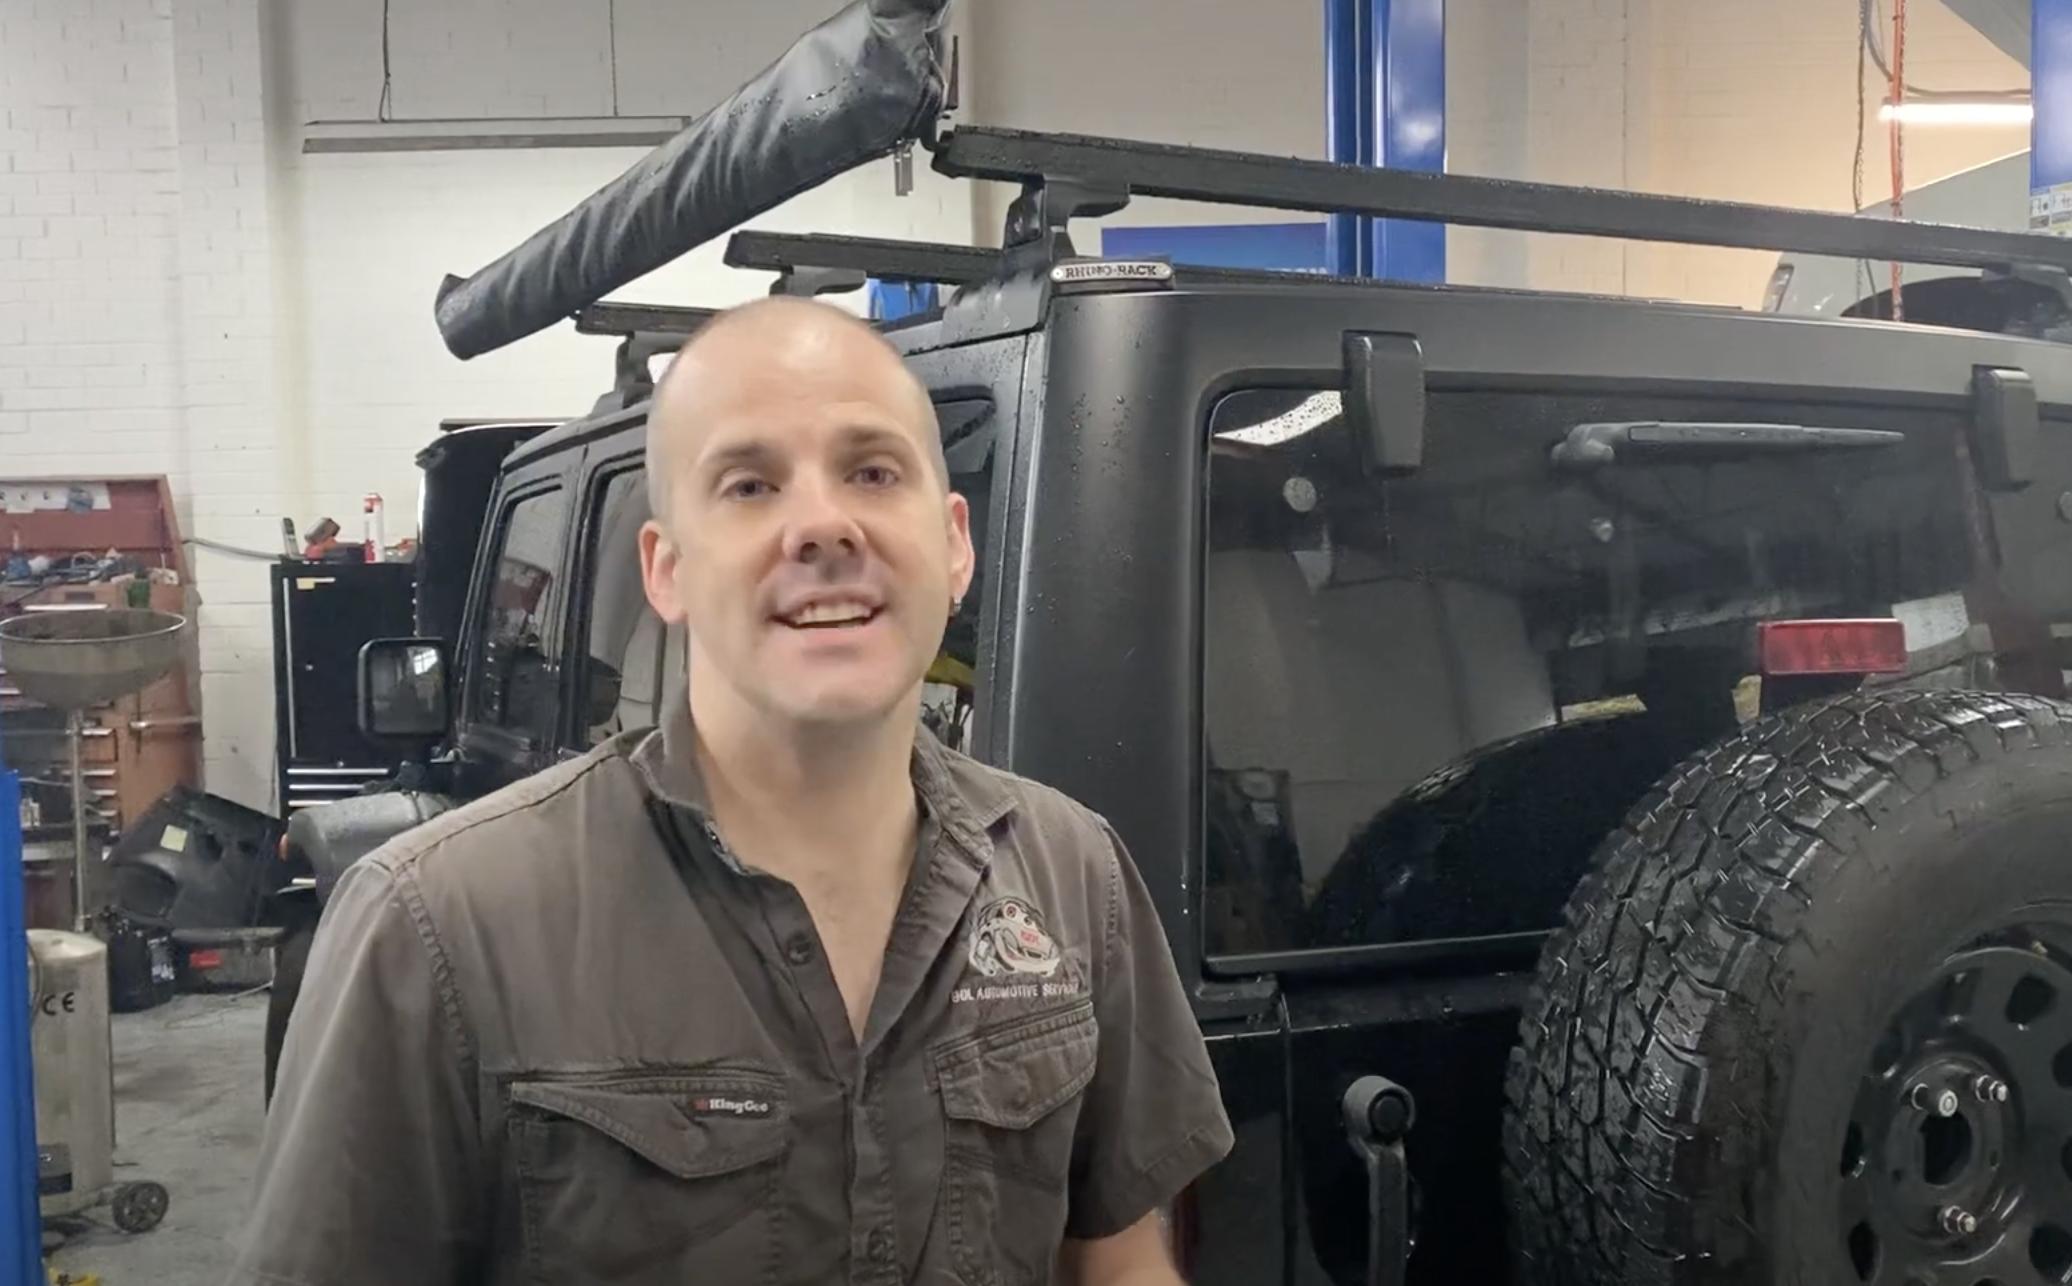 Jeep Wrangler Mechanic